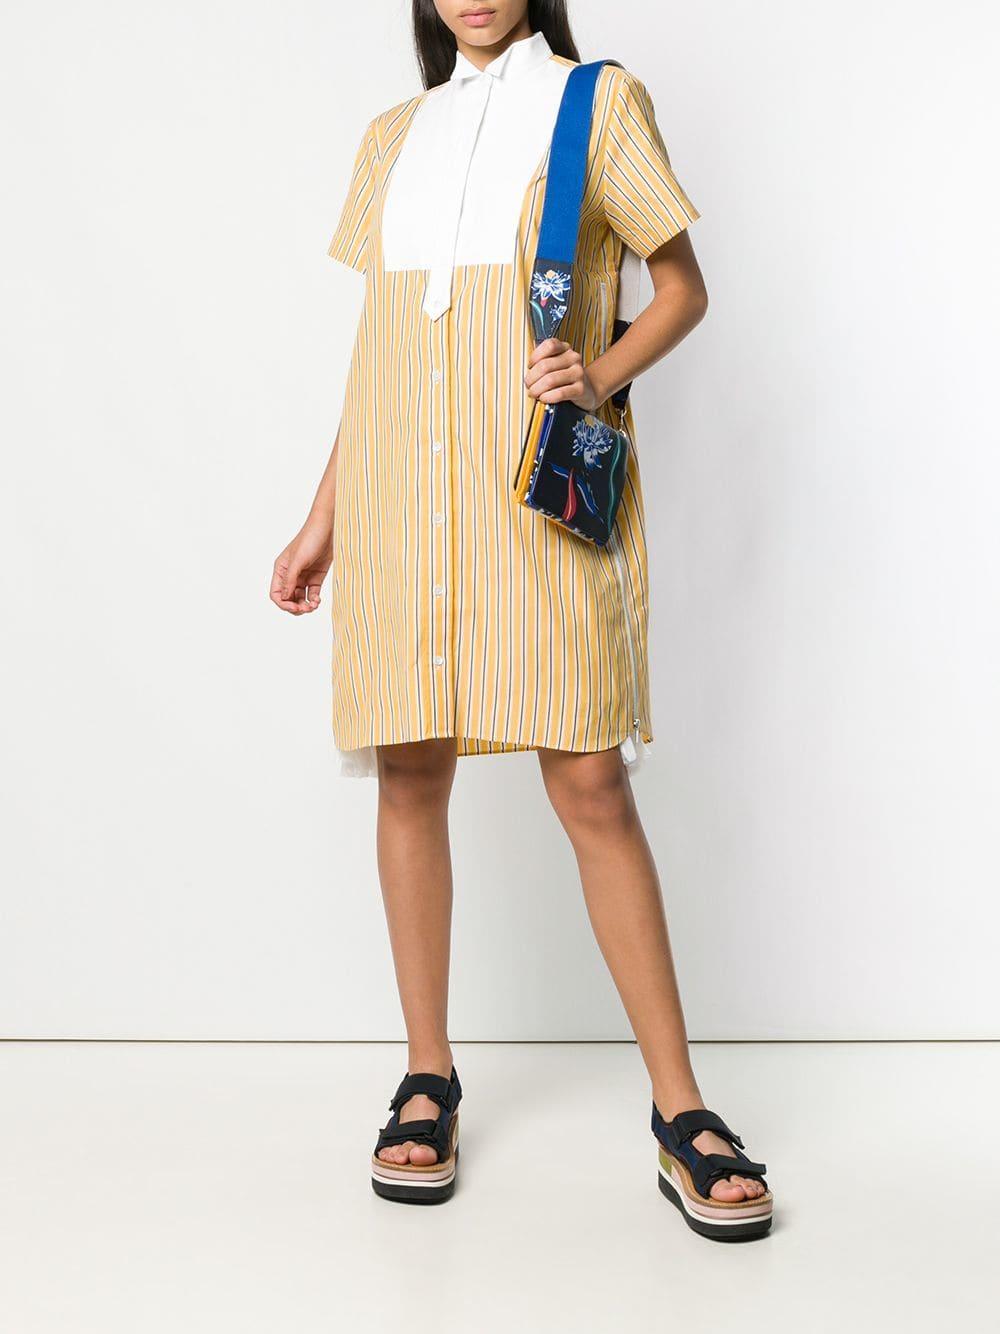 899382642cca8 Lyst - Sacai Striped Shirt Dress in Yellow